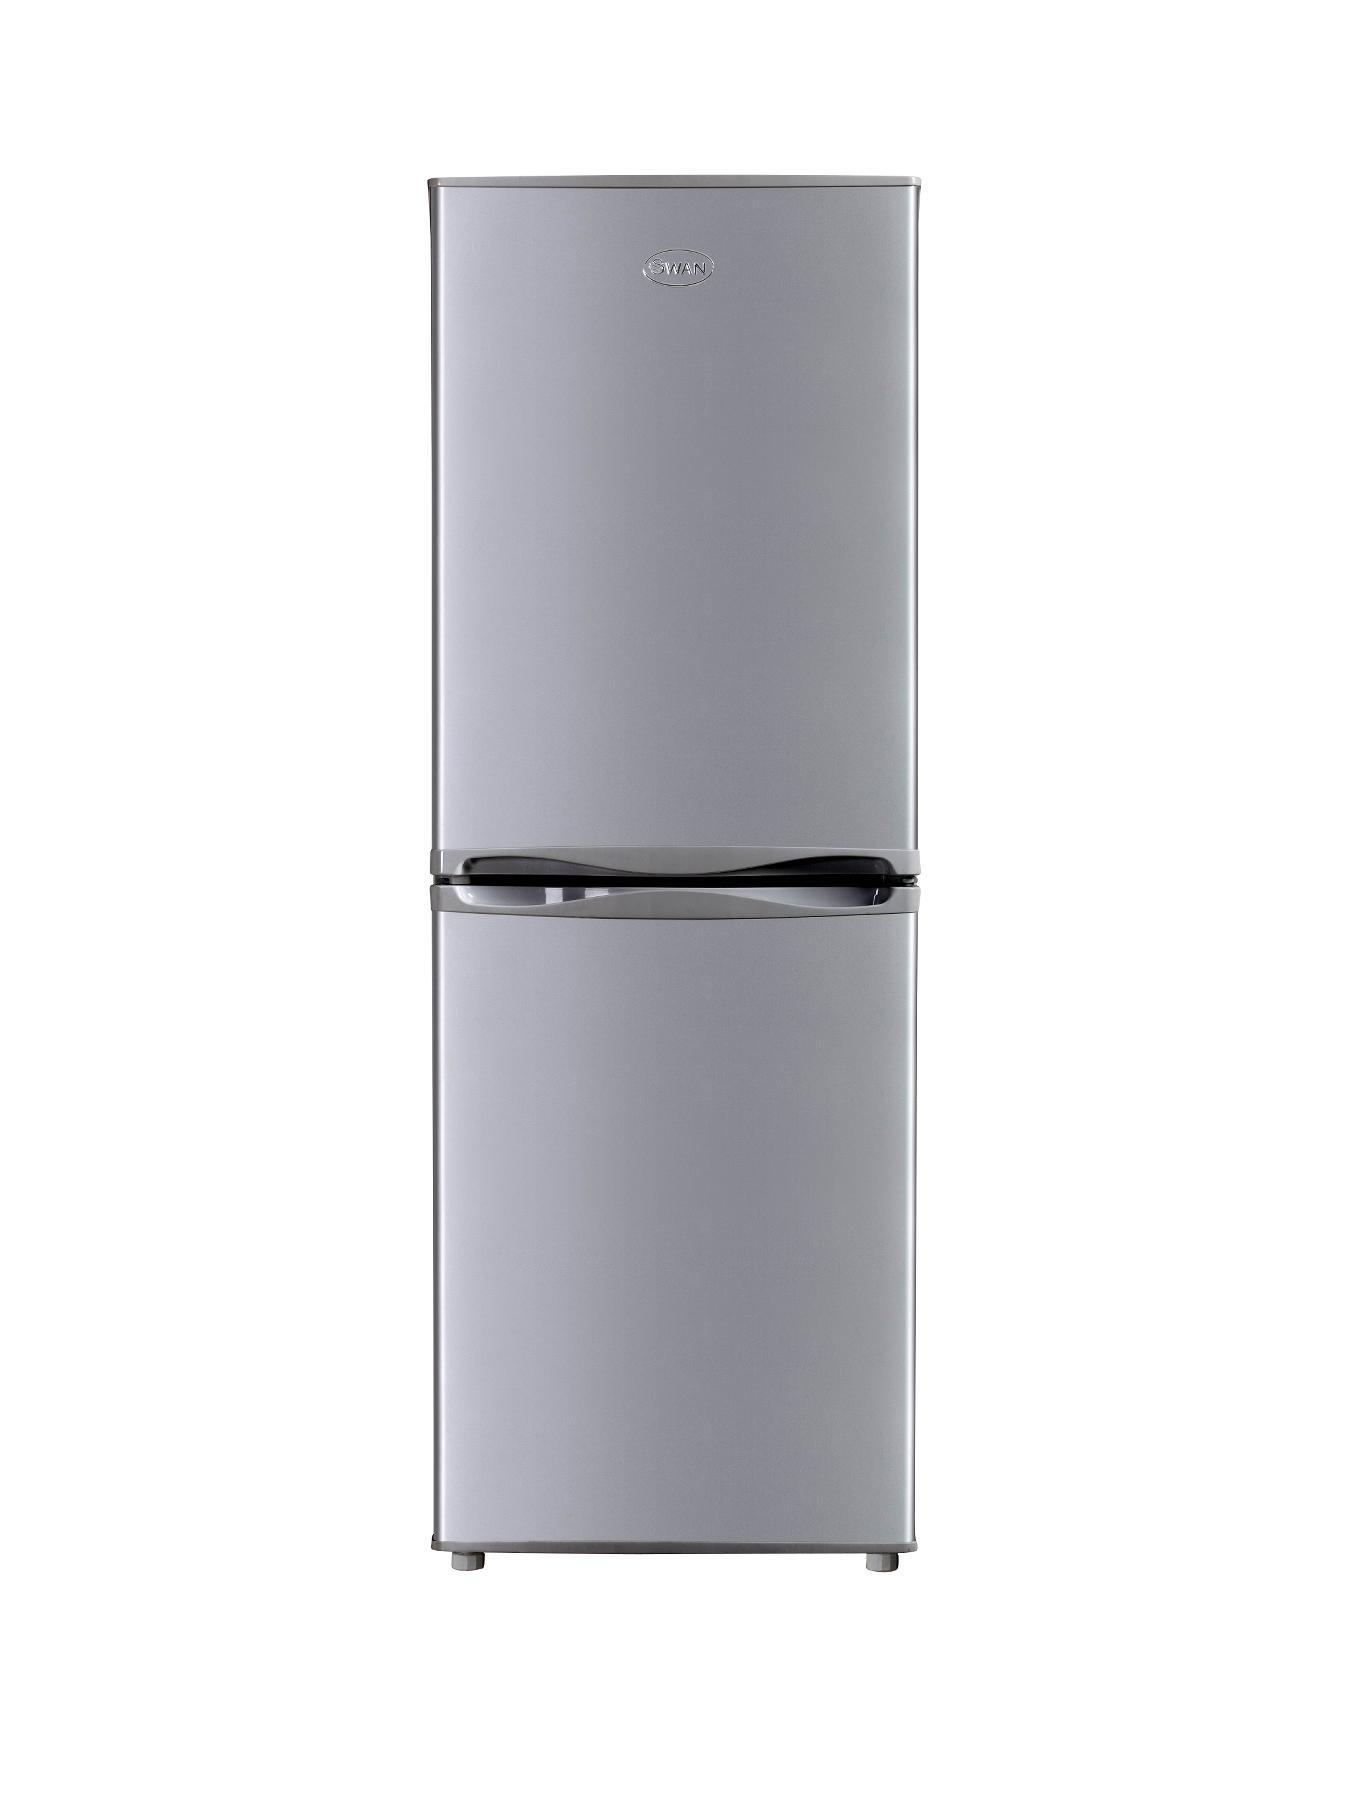 SR5290S 50cm Fridge Freezer - Silver